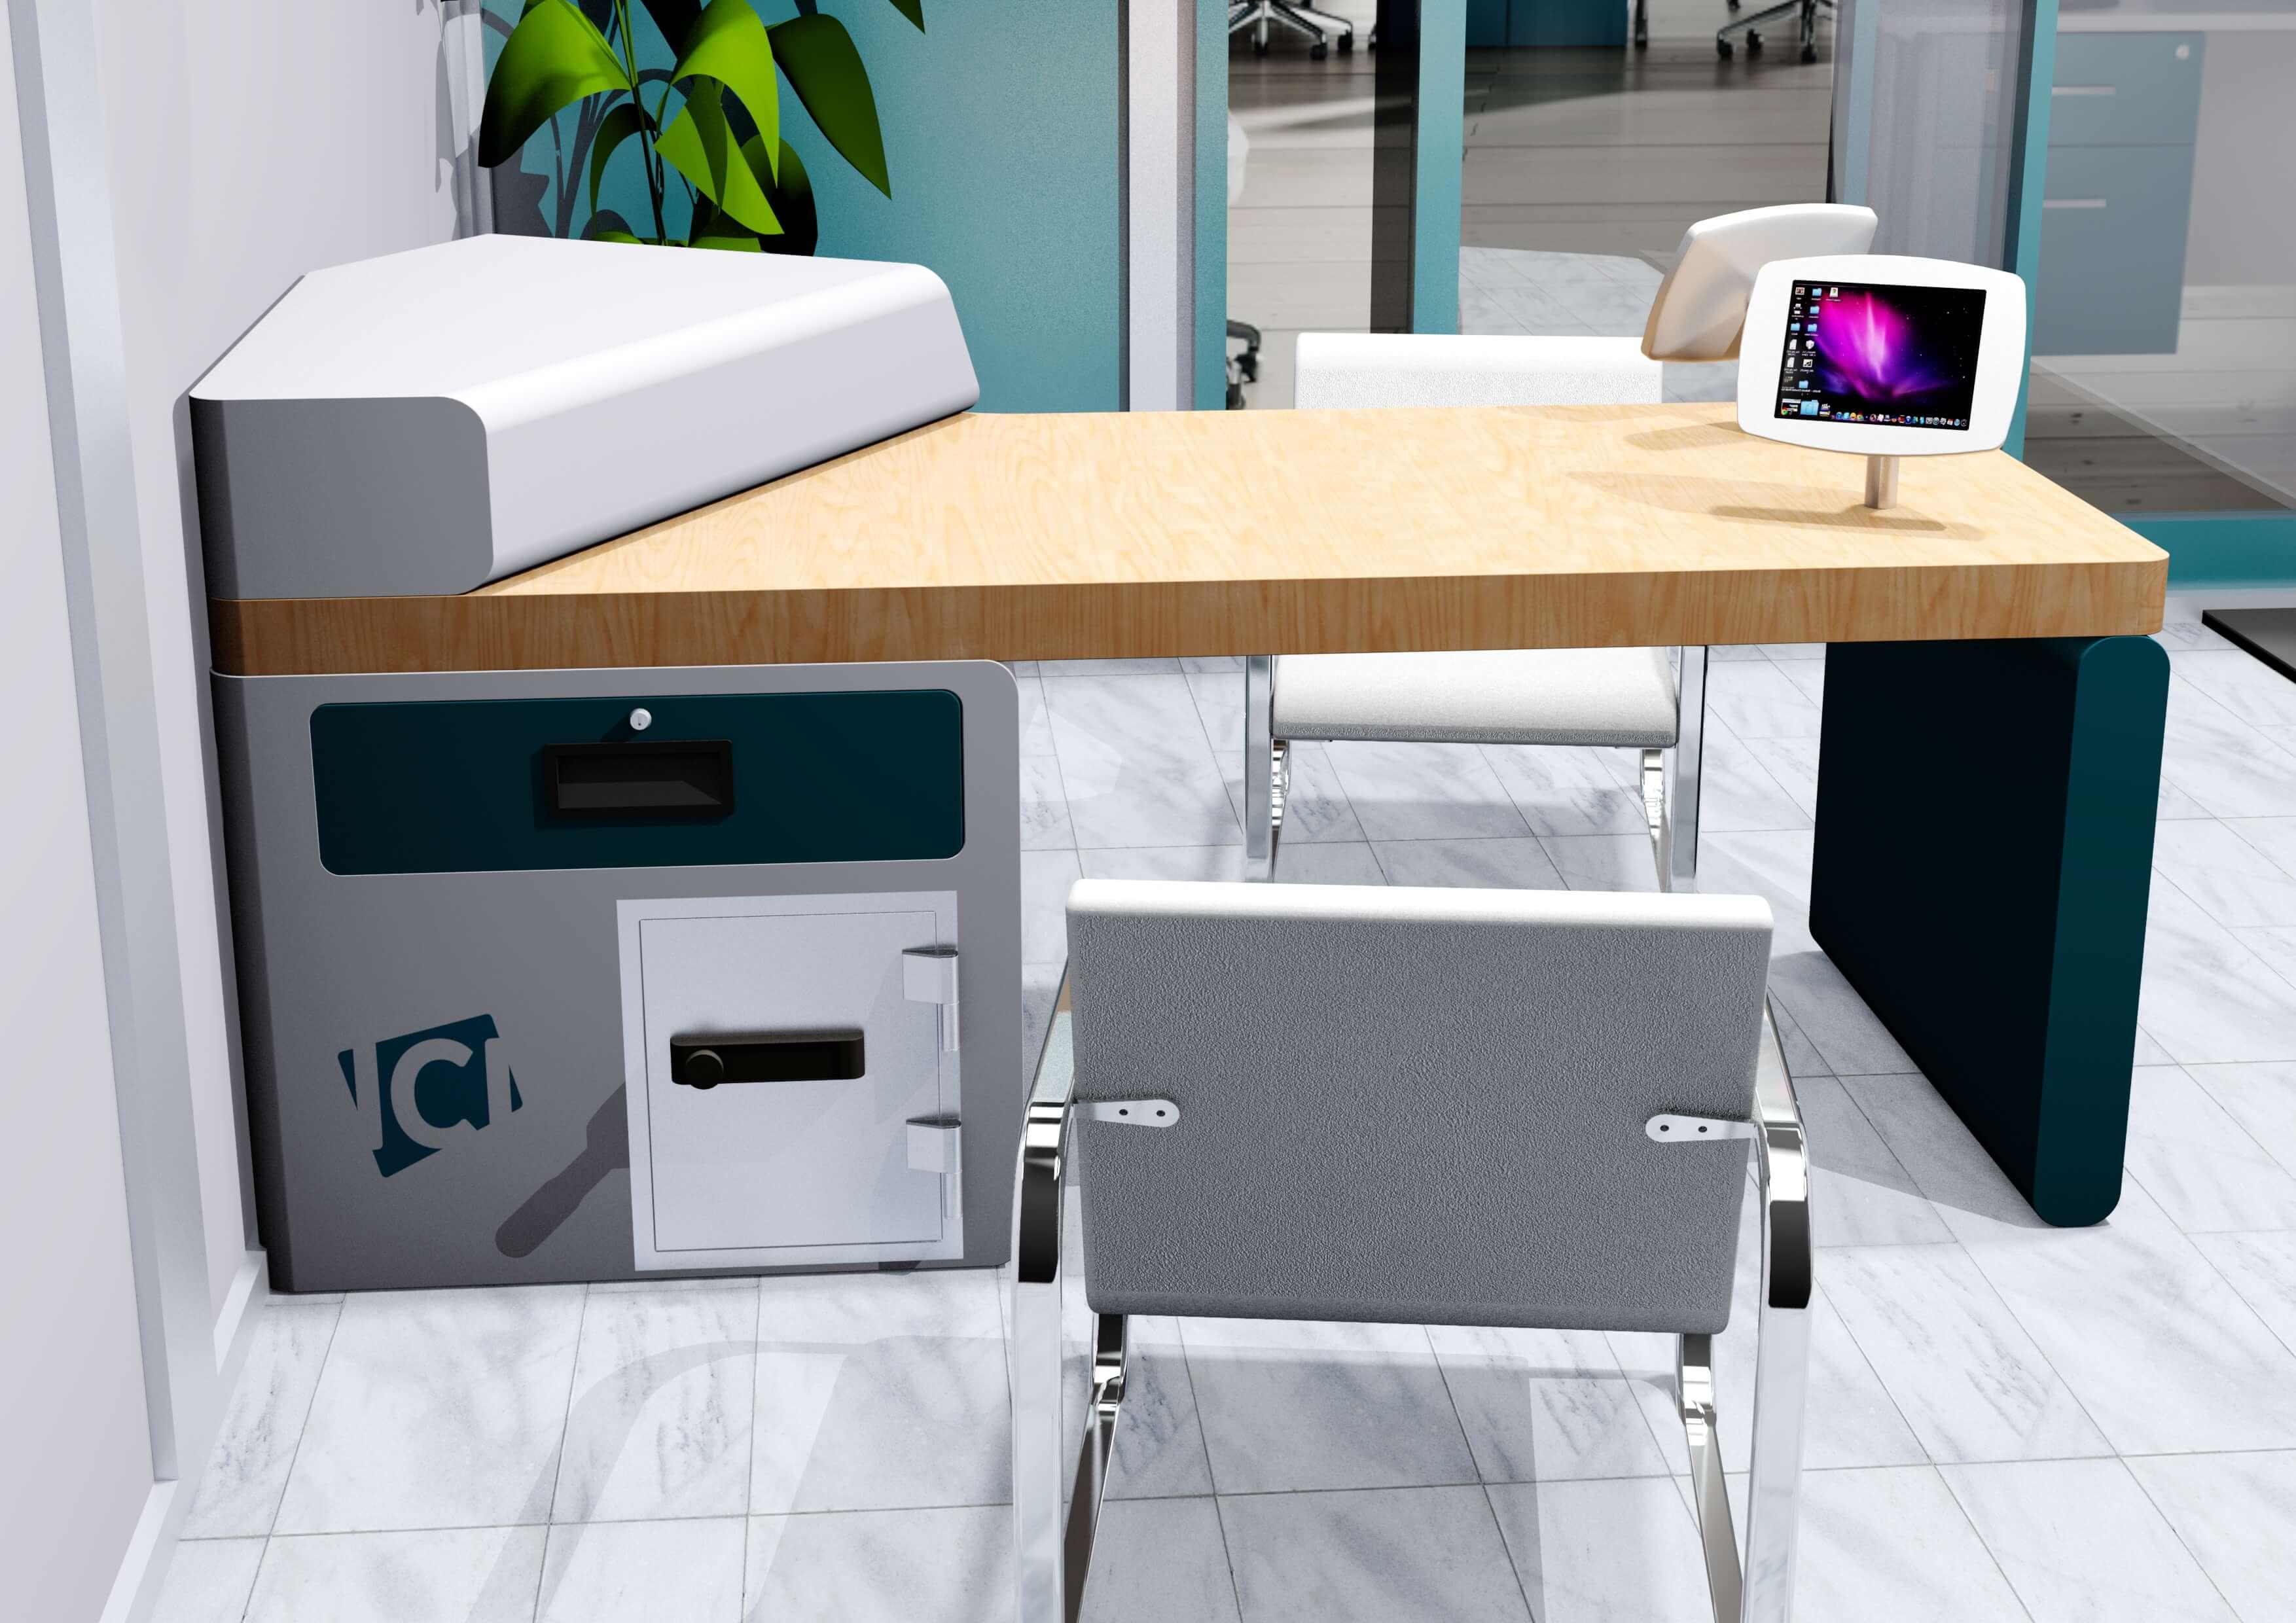 ICI Bank Desk - Staff